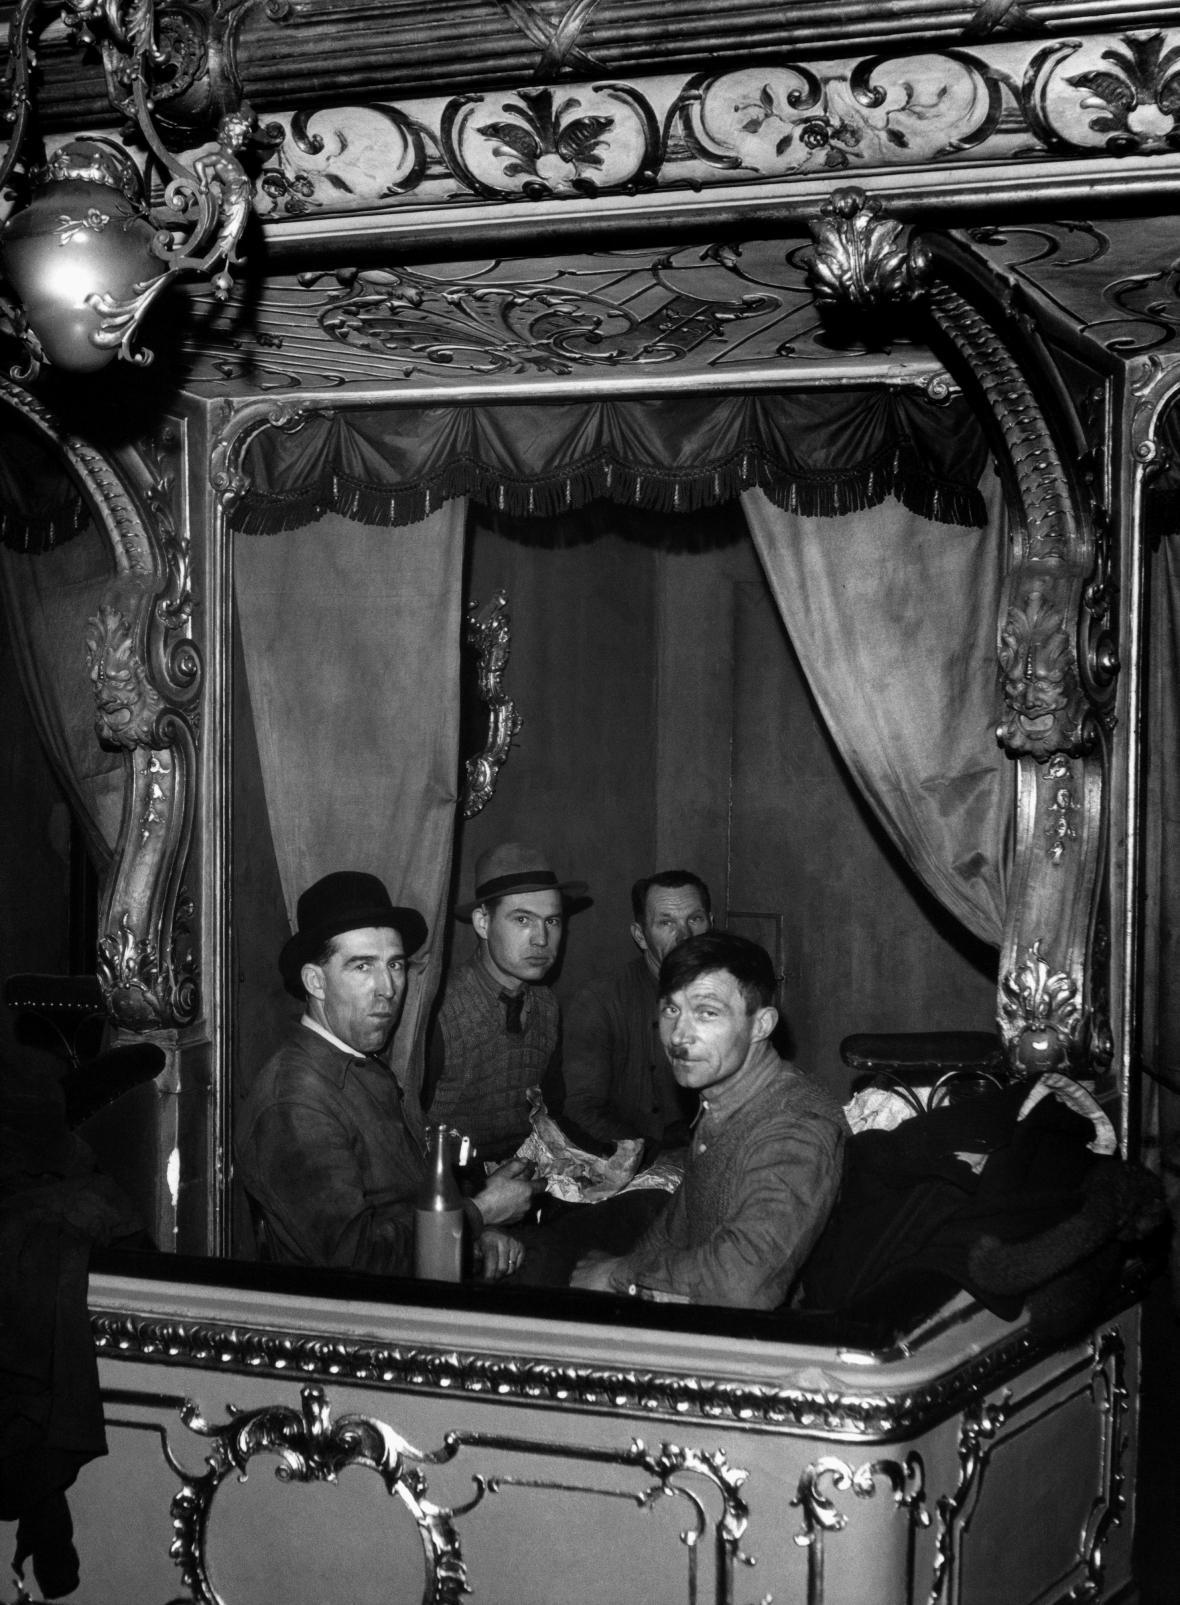 Svačina tesařů v lóži, 1948. Foto Václav Chochola, © Archiv B&M Chochola